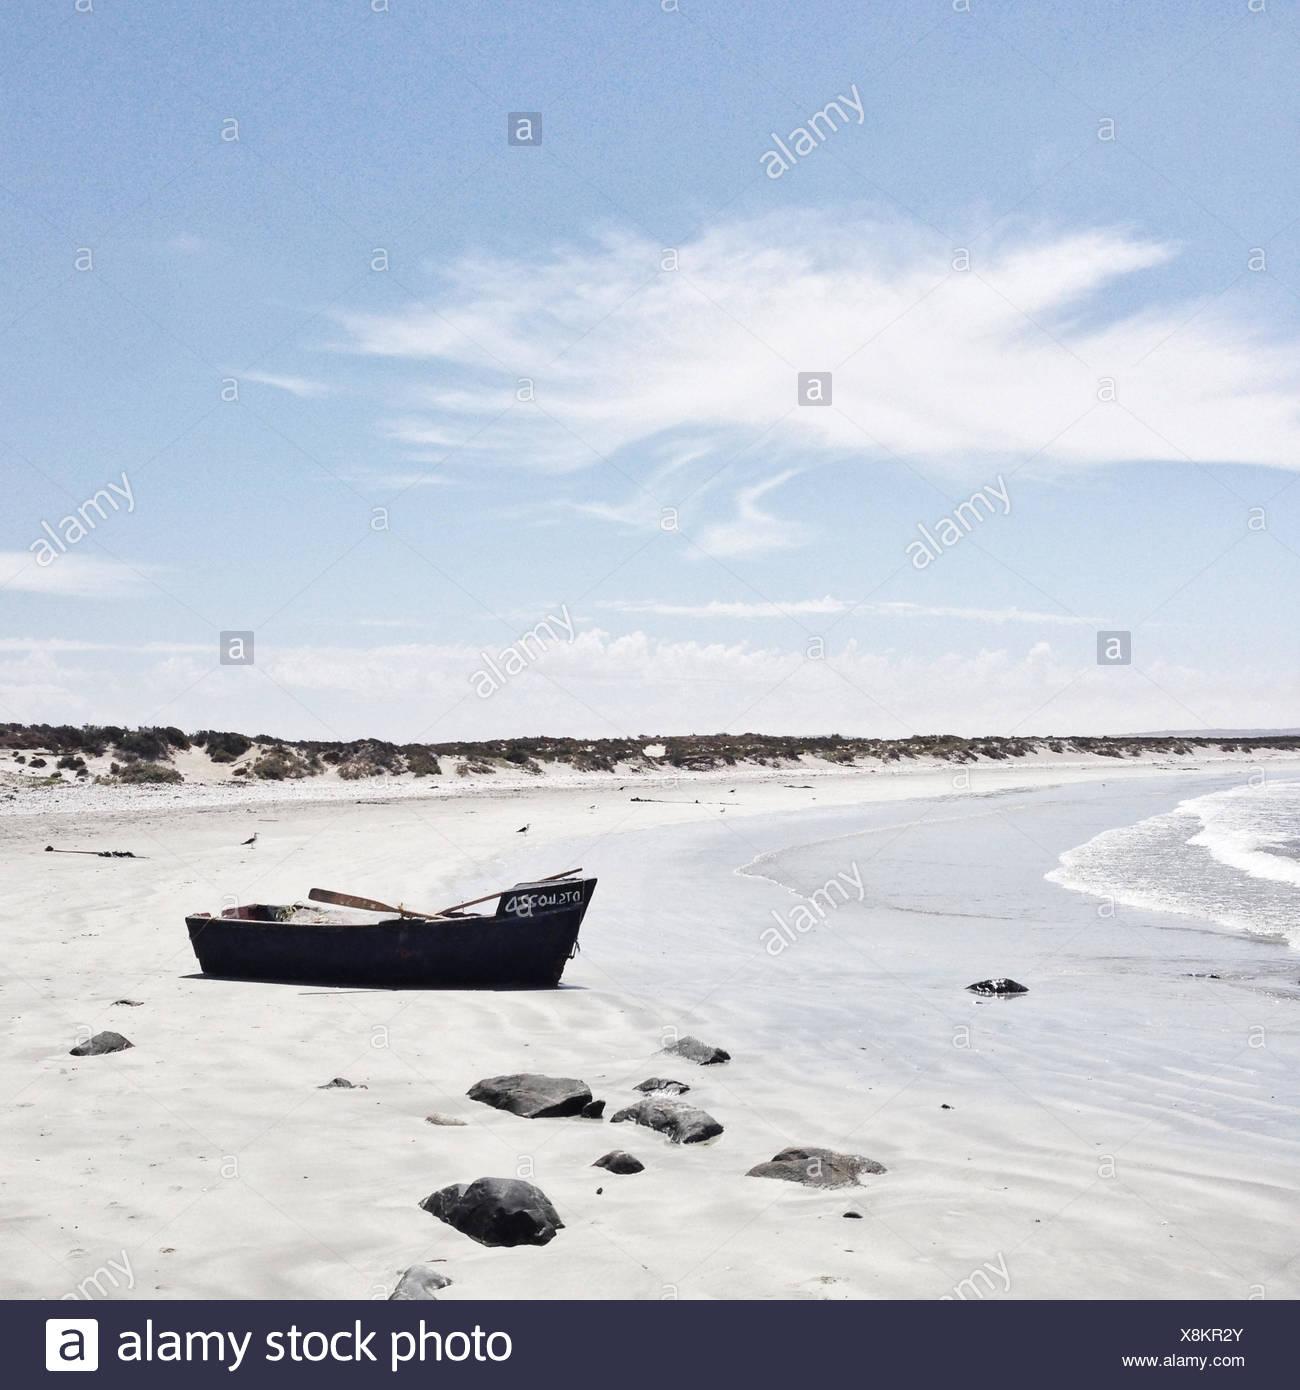 Abandoned boat on beach - Stock Image